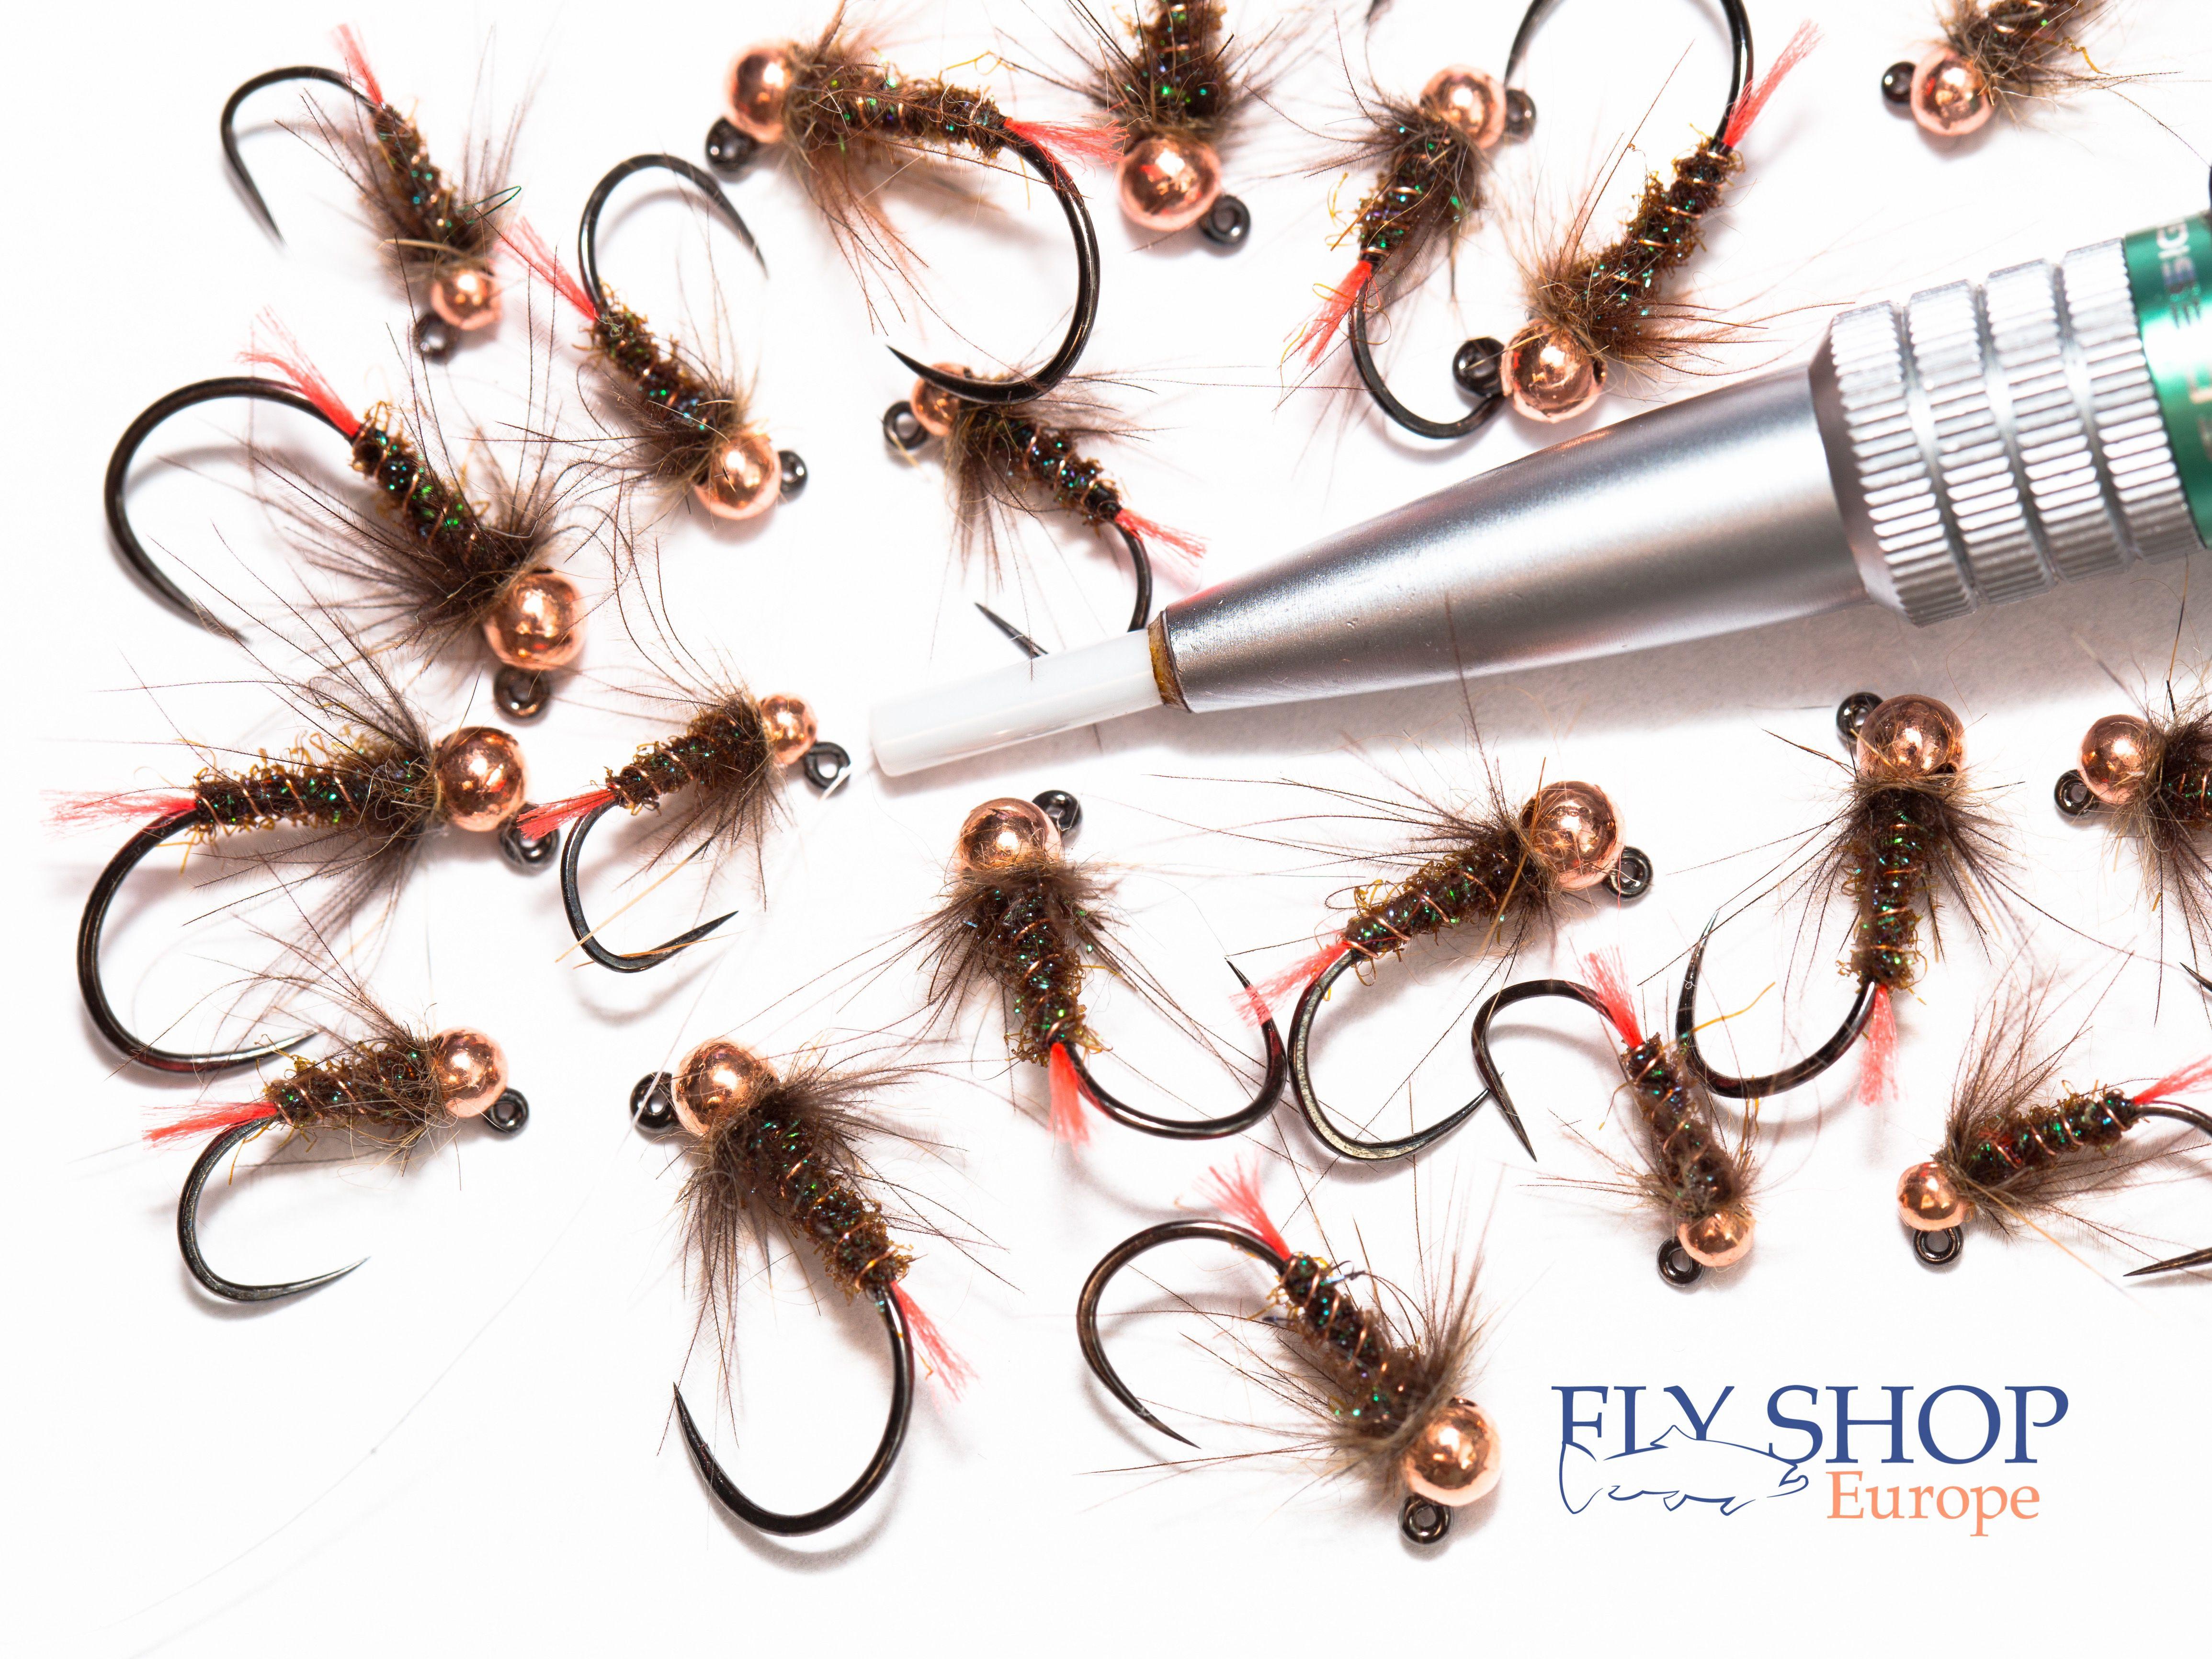 Brown Spectra Nymph | Nymphs | Nymph, Fish, Brown